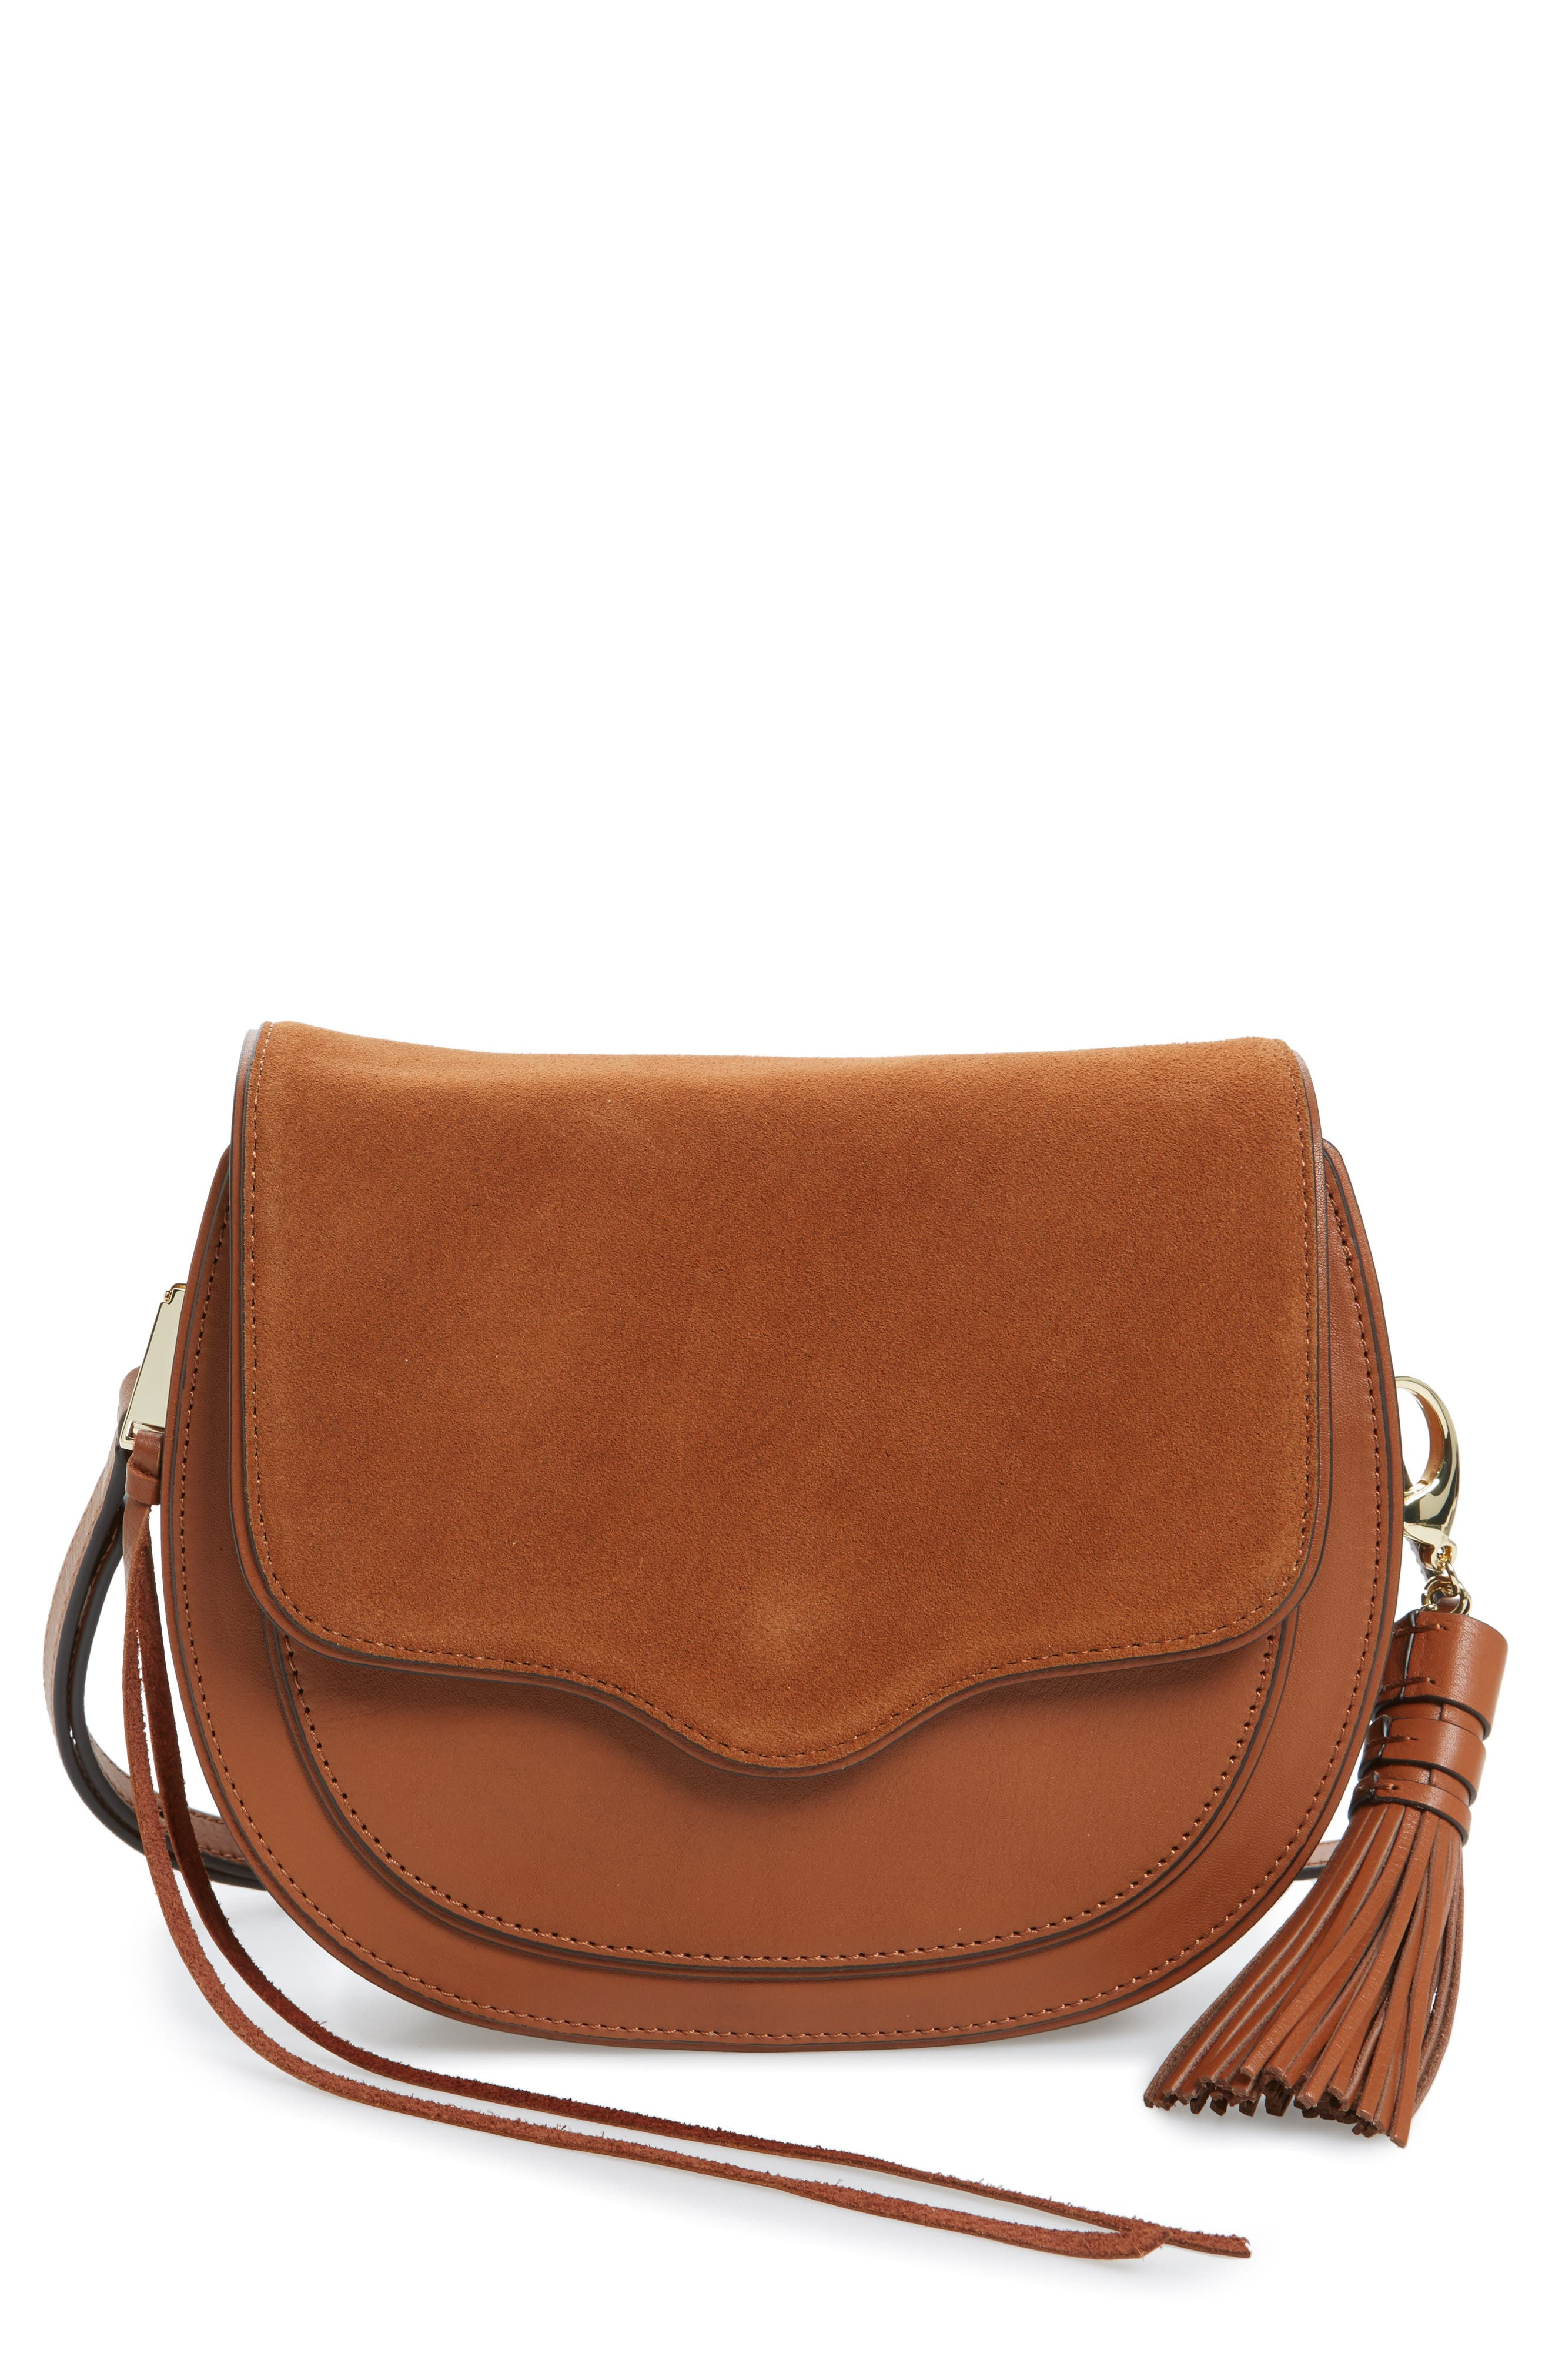 Alternate Image 1 Selected - Rebecca Minkoff Large Suki Crossbody Bag